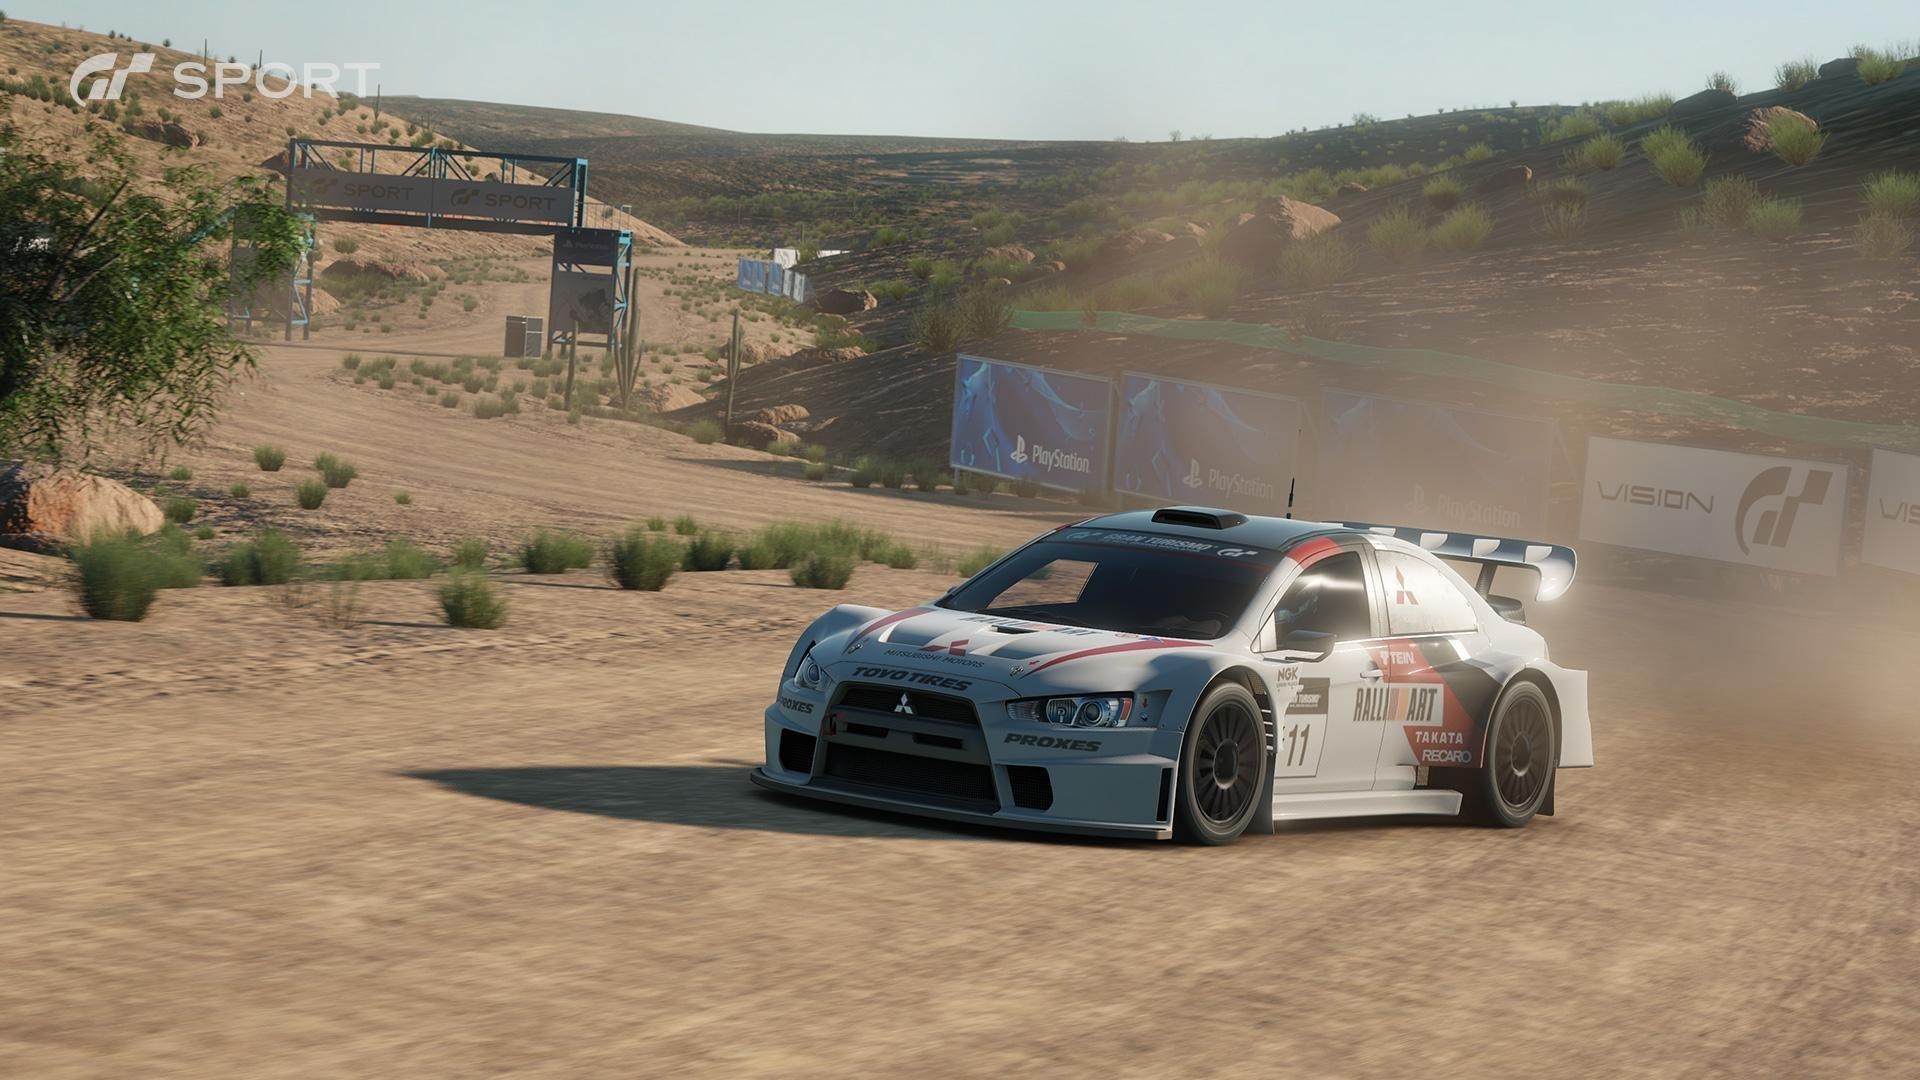 Amazon.com: GT Sport - PlayStation 4: Sony Interactive Entertai: Video